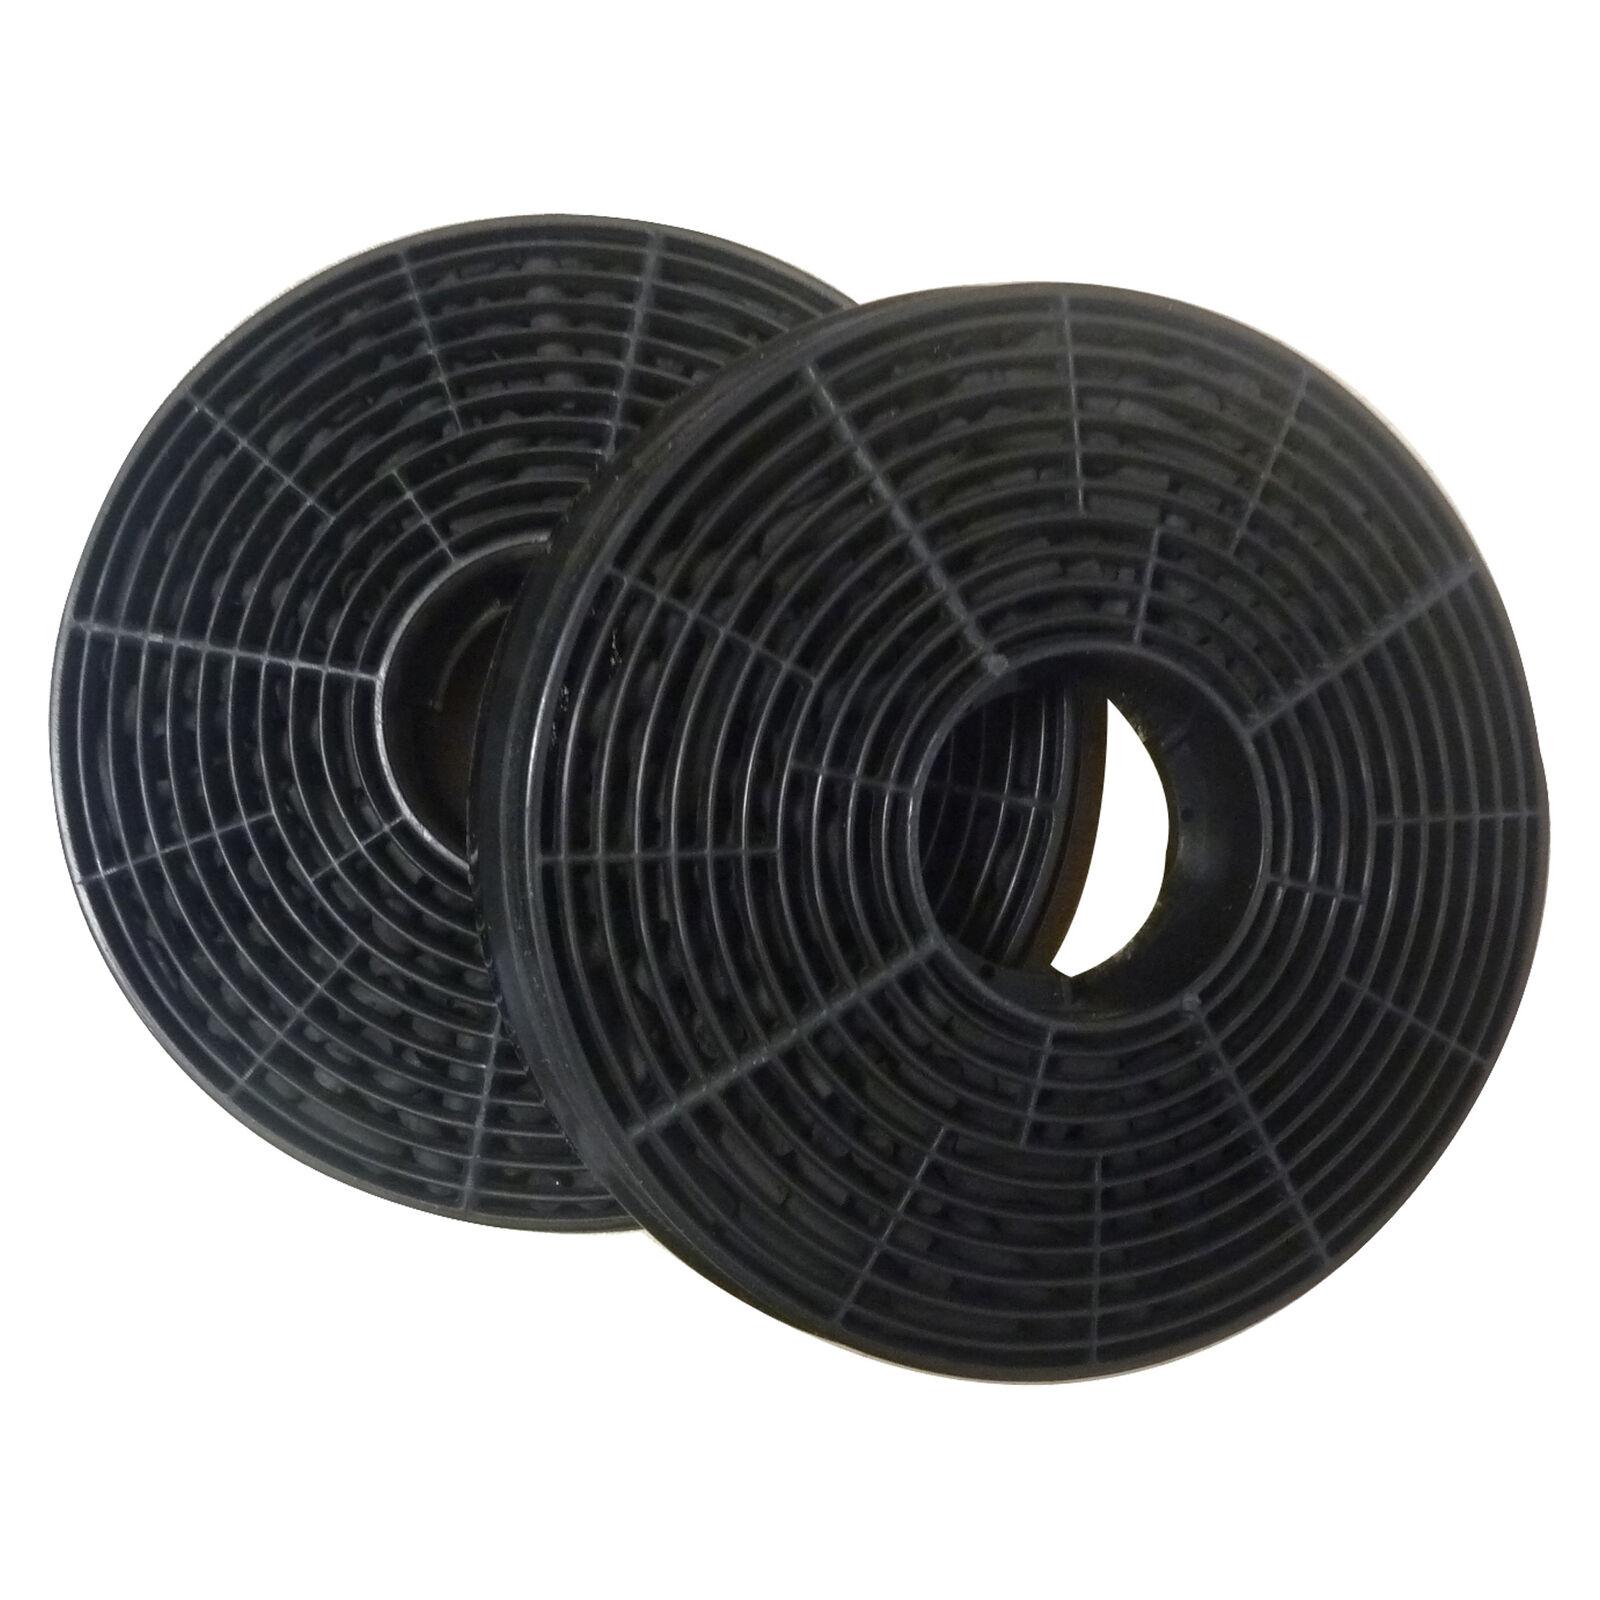 VDAKF02 Filtro de carbón activo para campana de cocina Viesta VDE6065SR